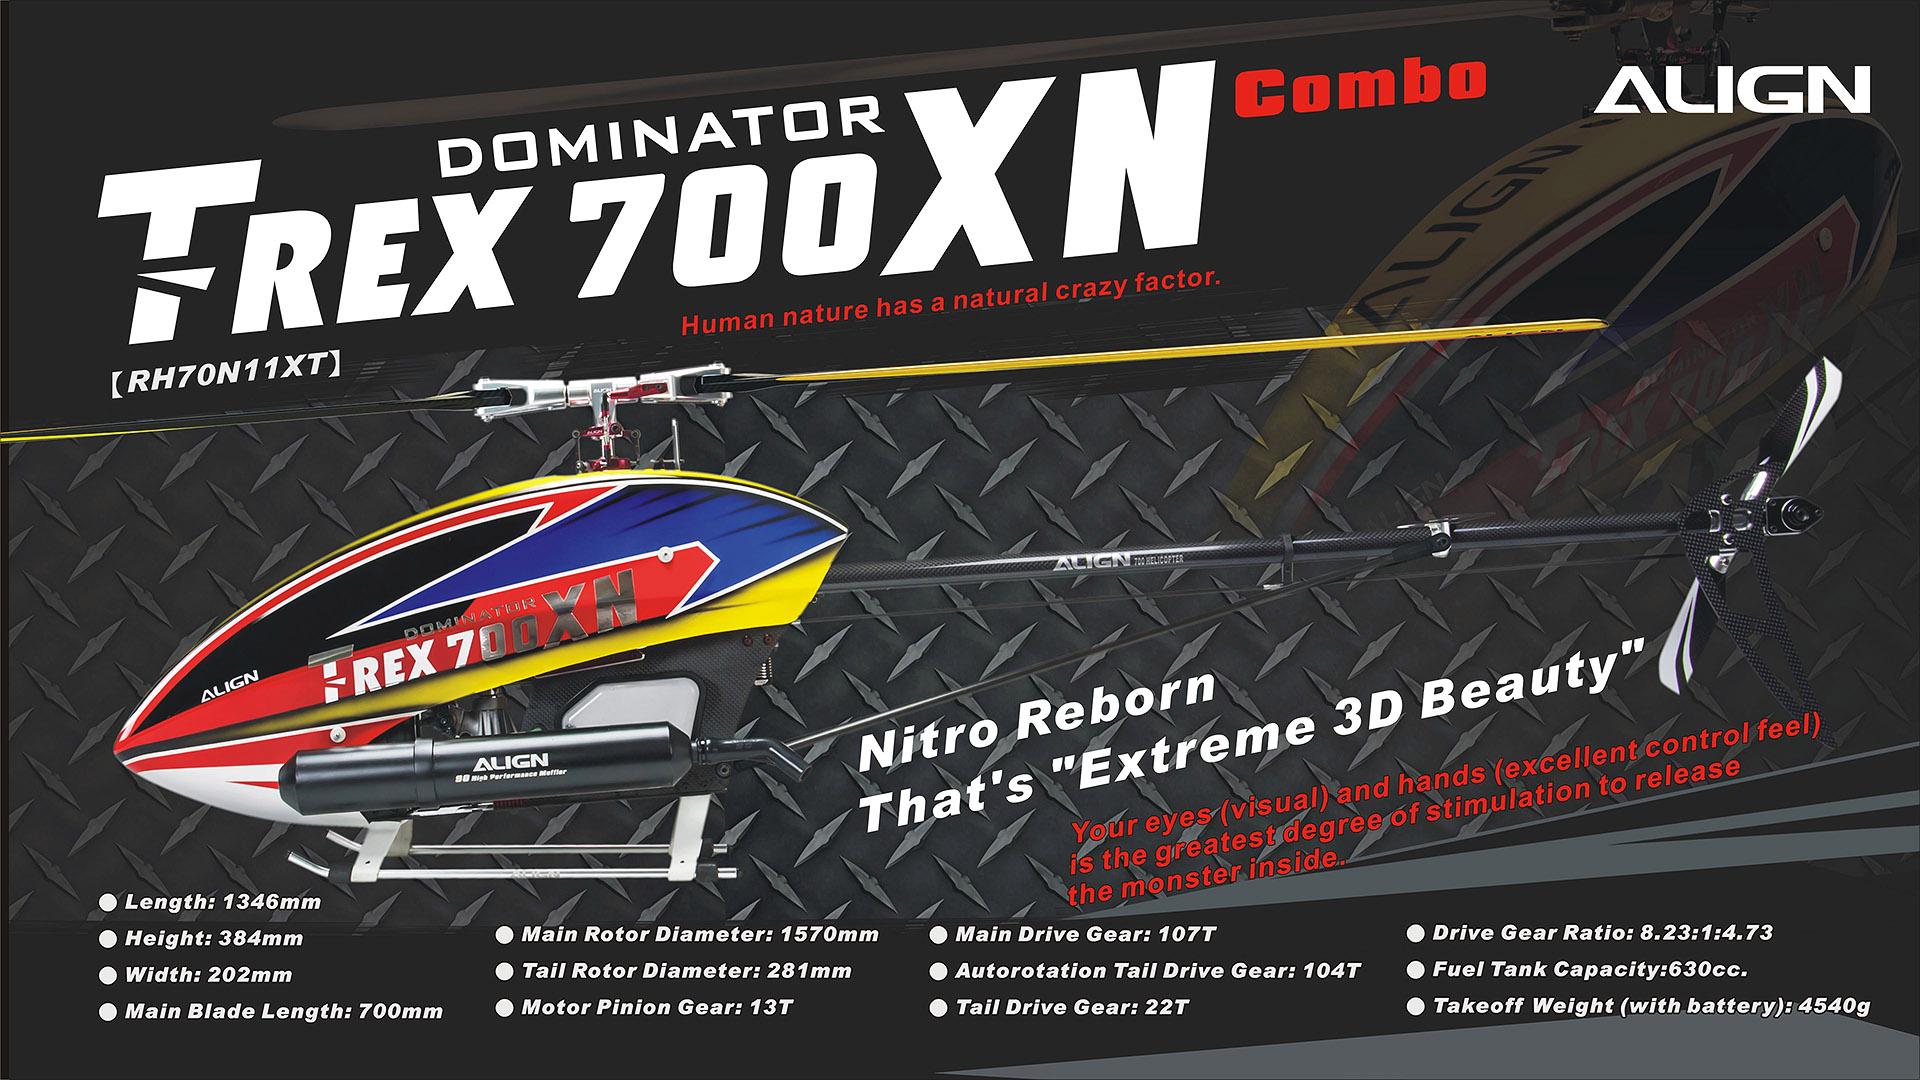 ALIGN T-REX 700XN コンボ【予約注文】